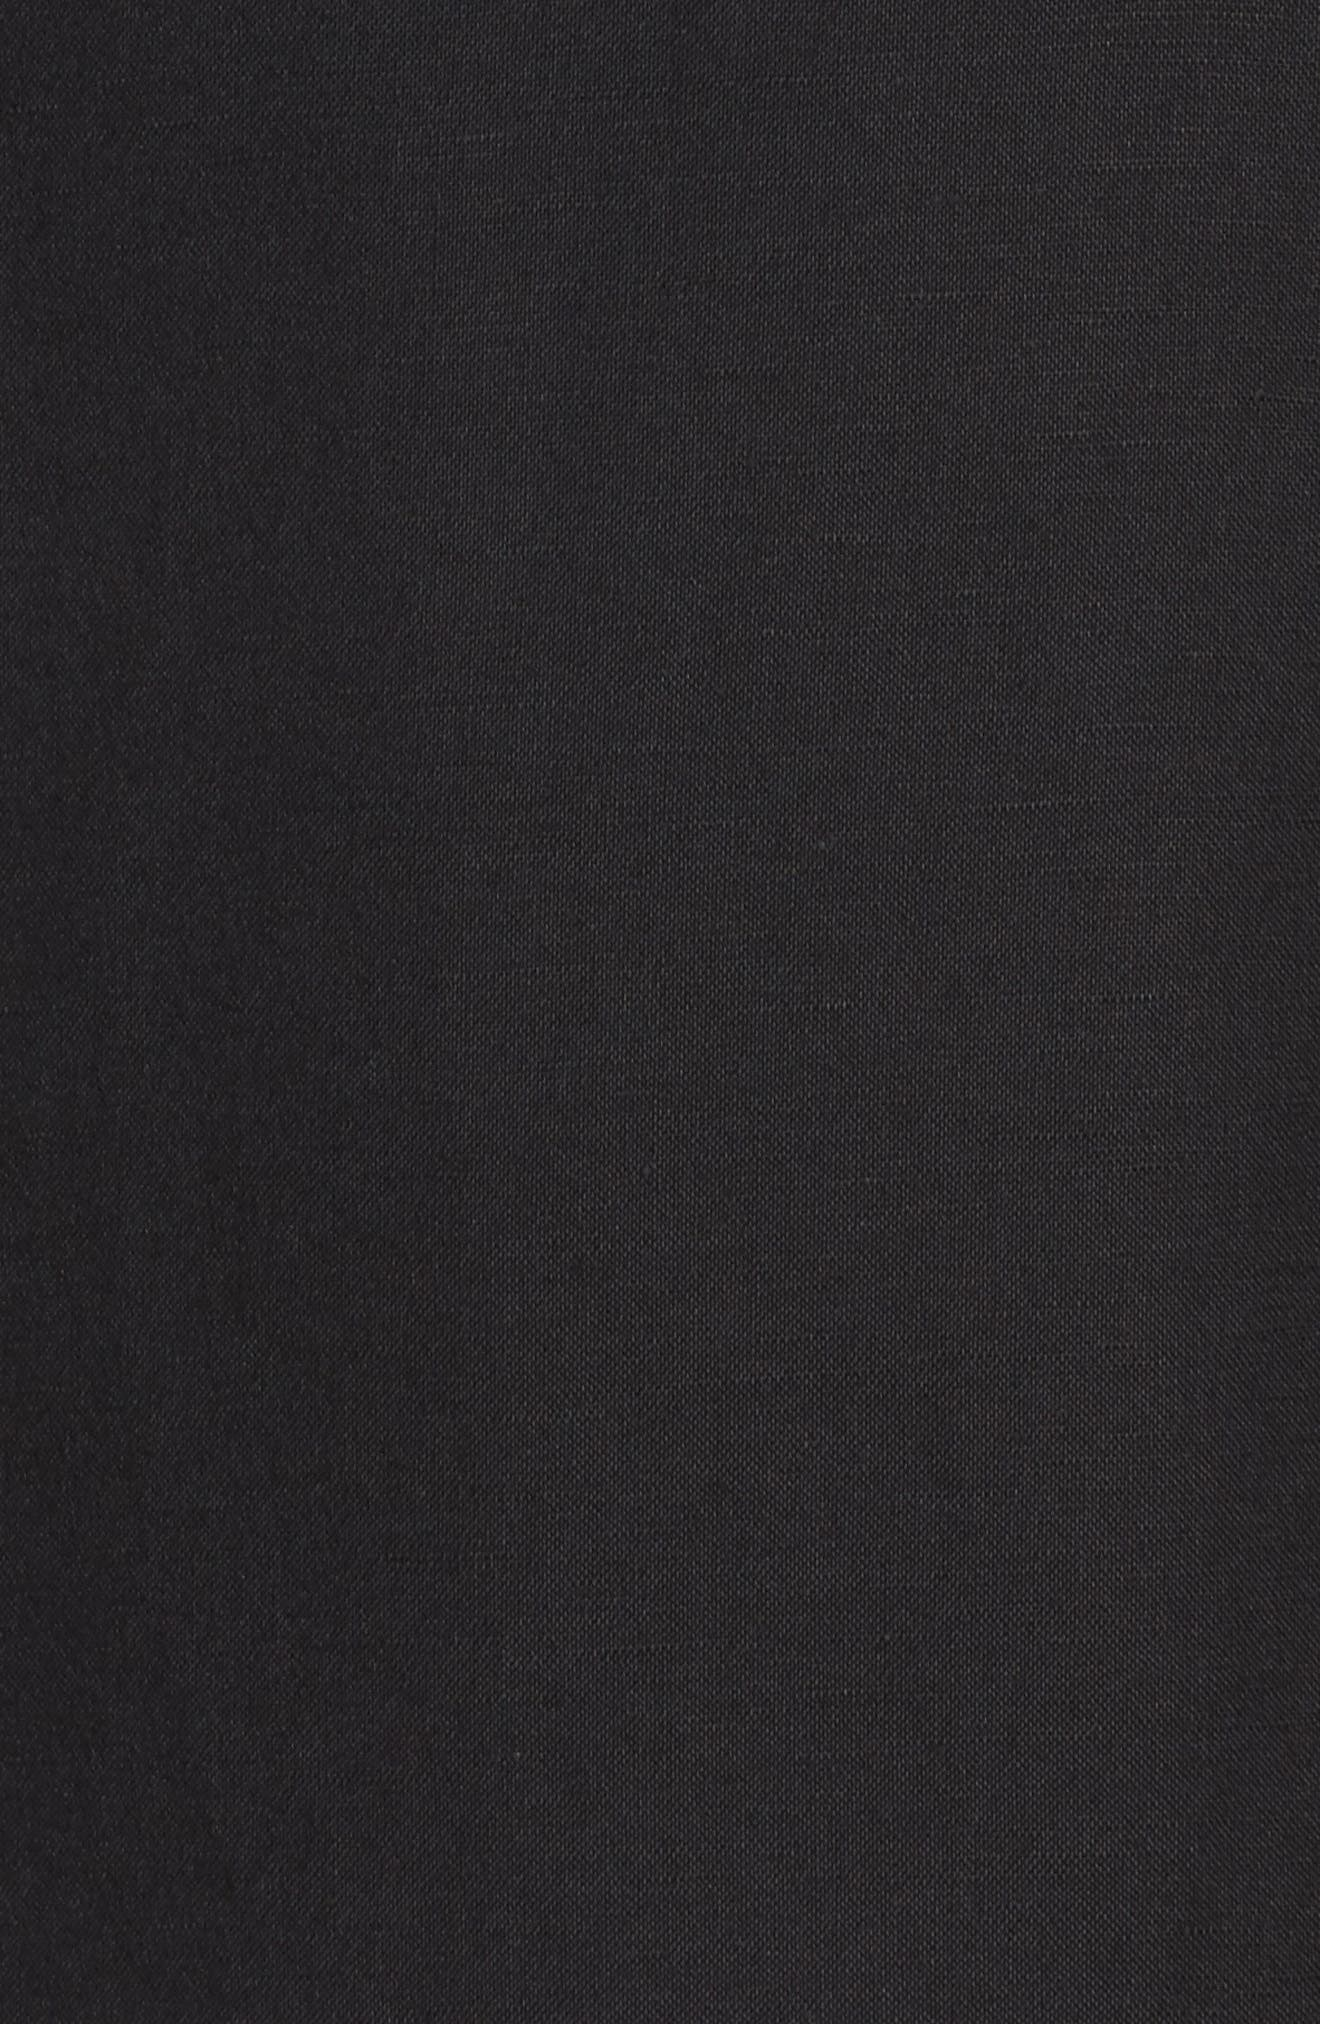 Linen Blend Sheath Dress,                             Alternate thumbnail 5, color,                             Black/ Ivory